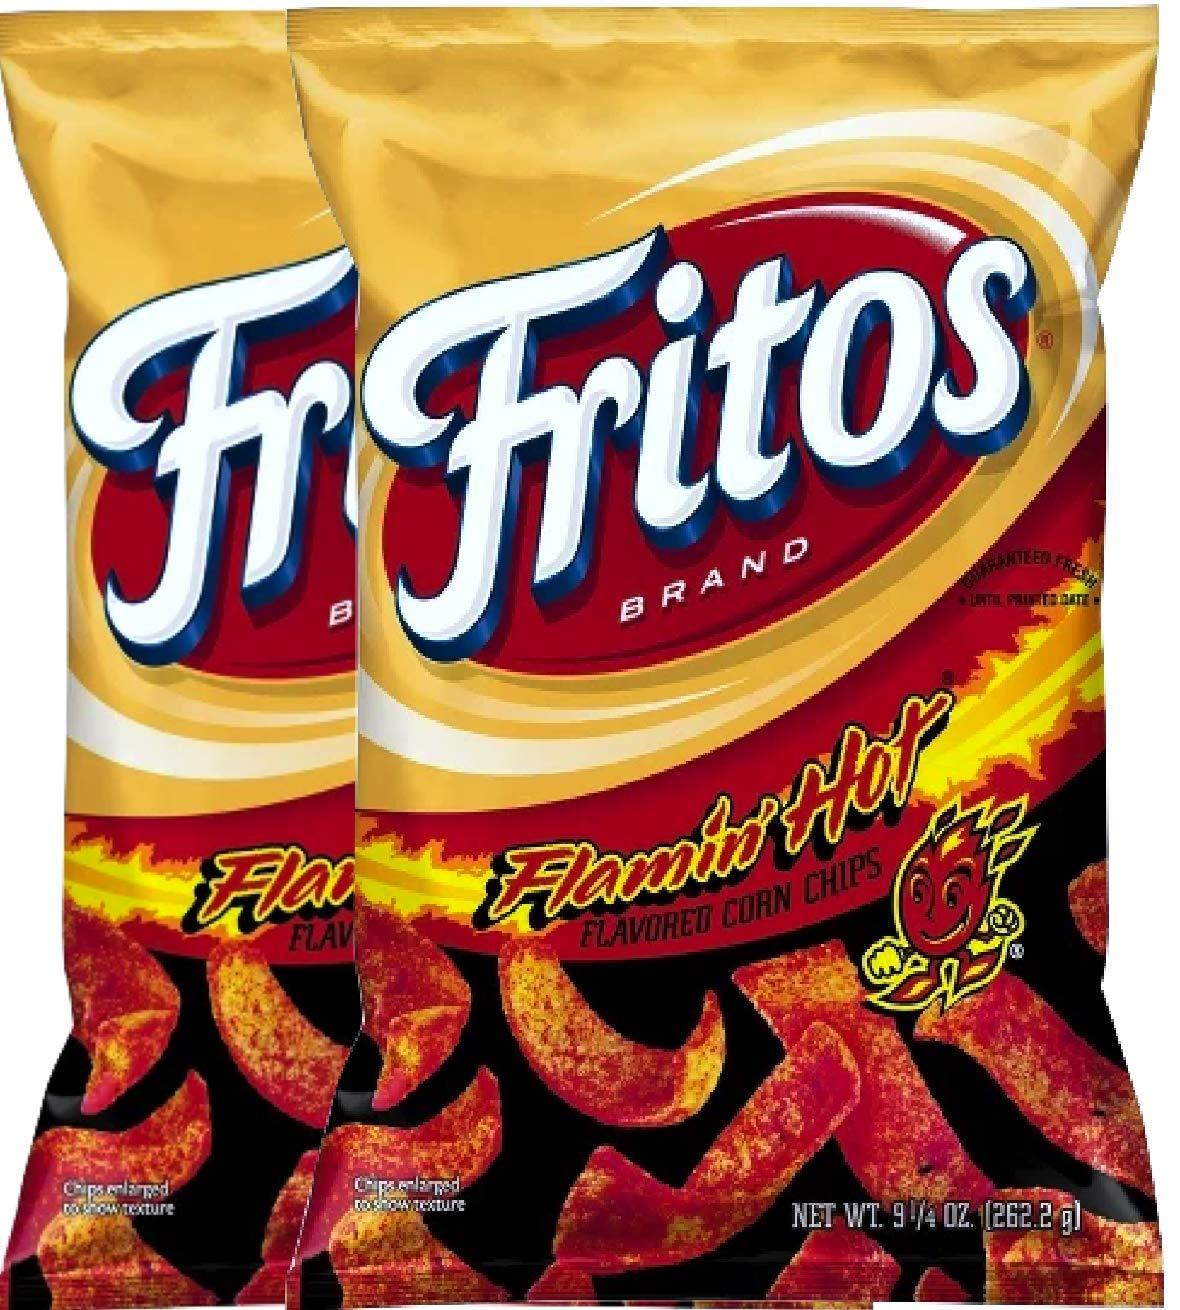 NEW Fritos Flamin Hot Flavored Corn Chips - 9.25oz (2)